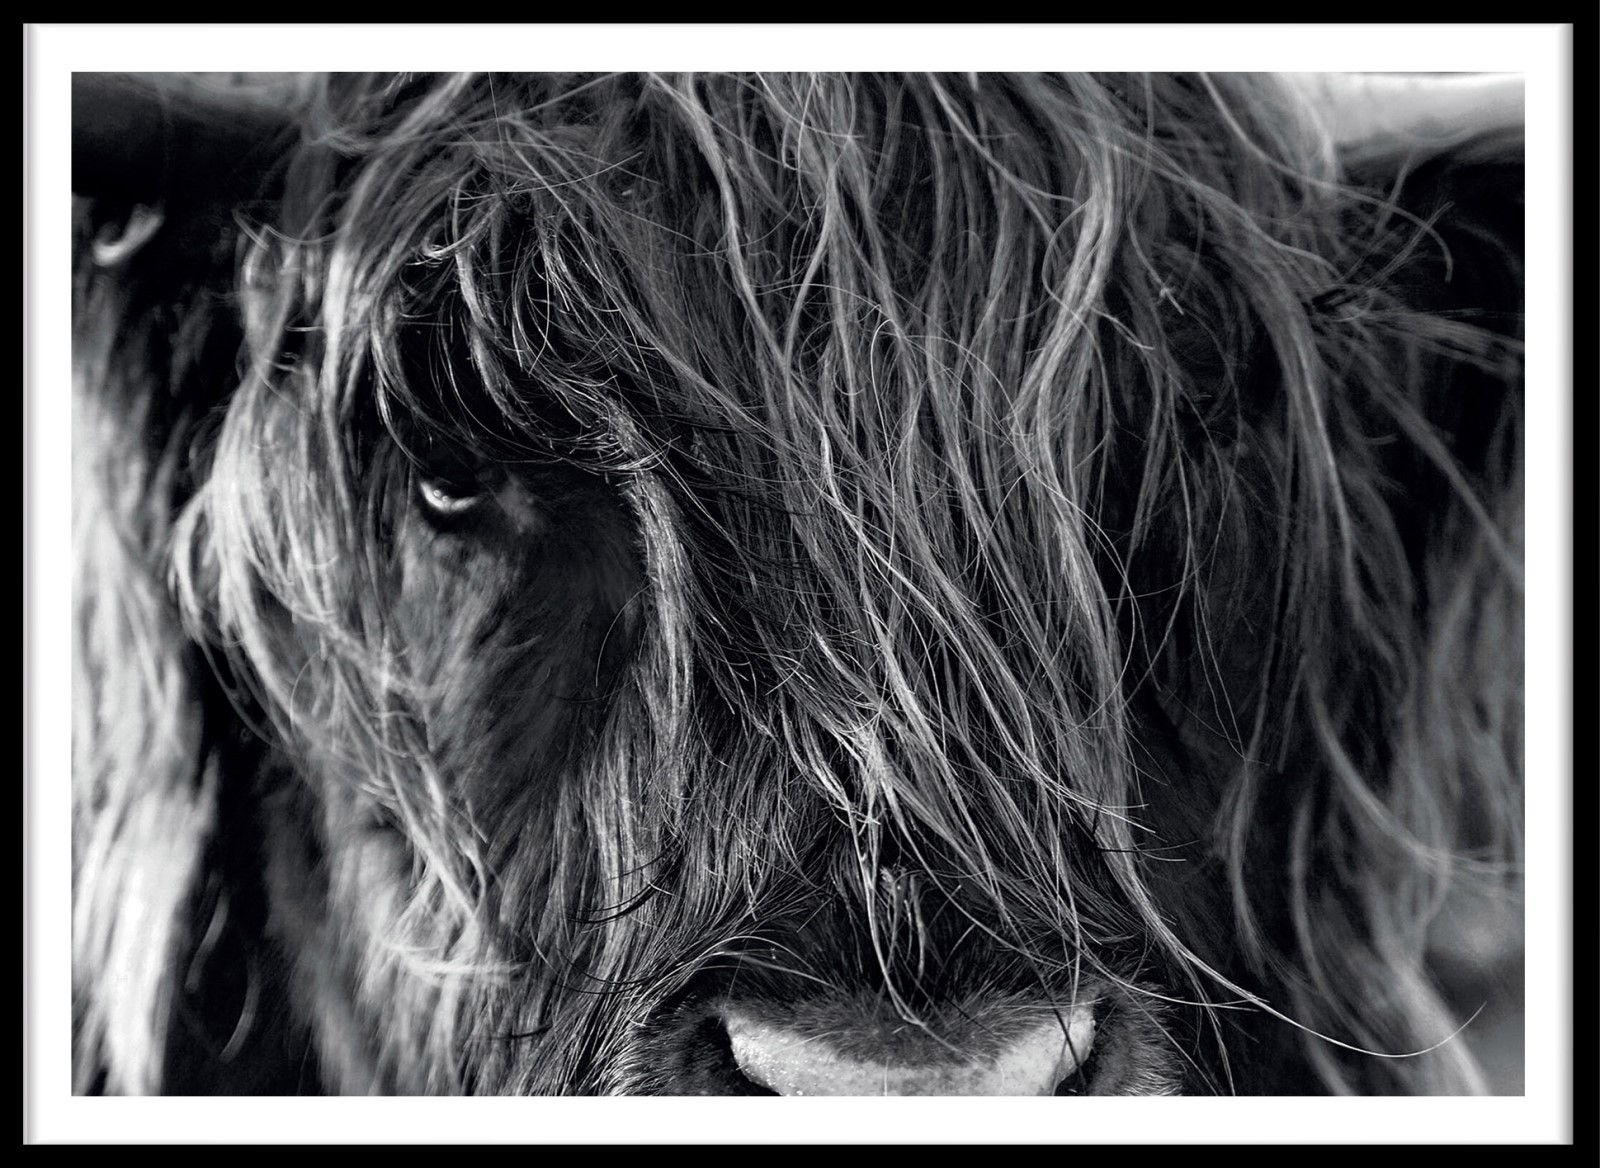 Animaux - La pose du Yak